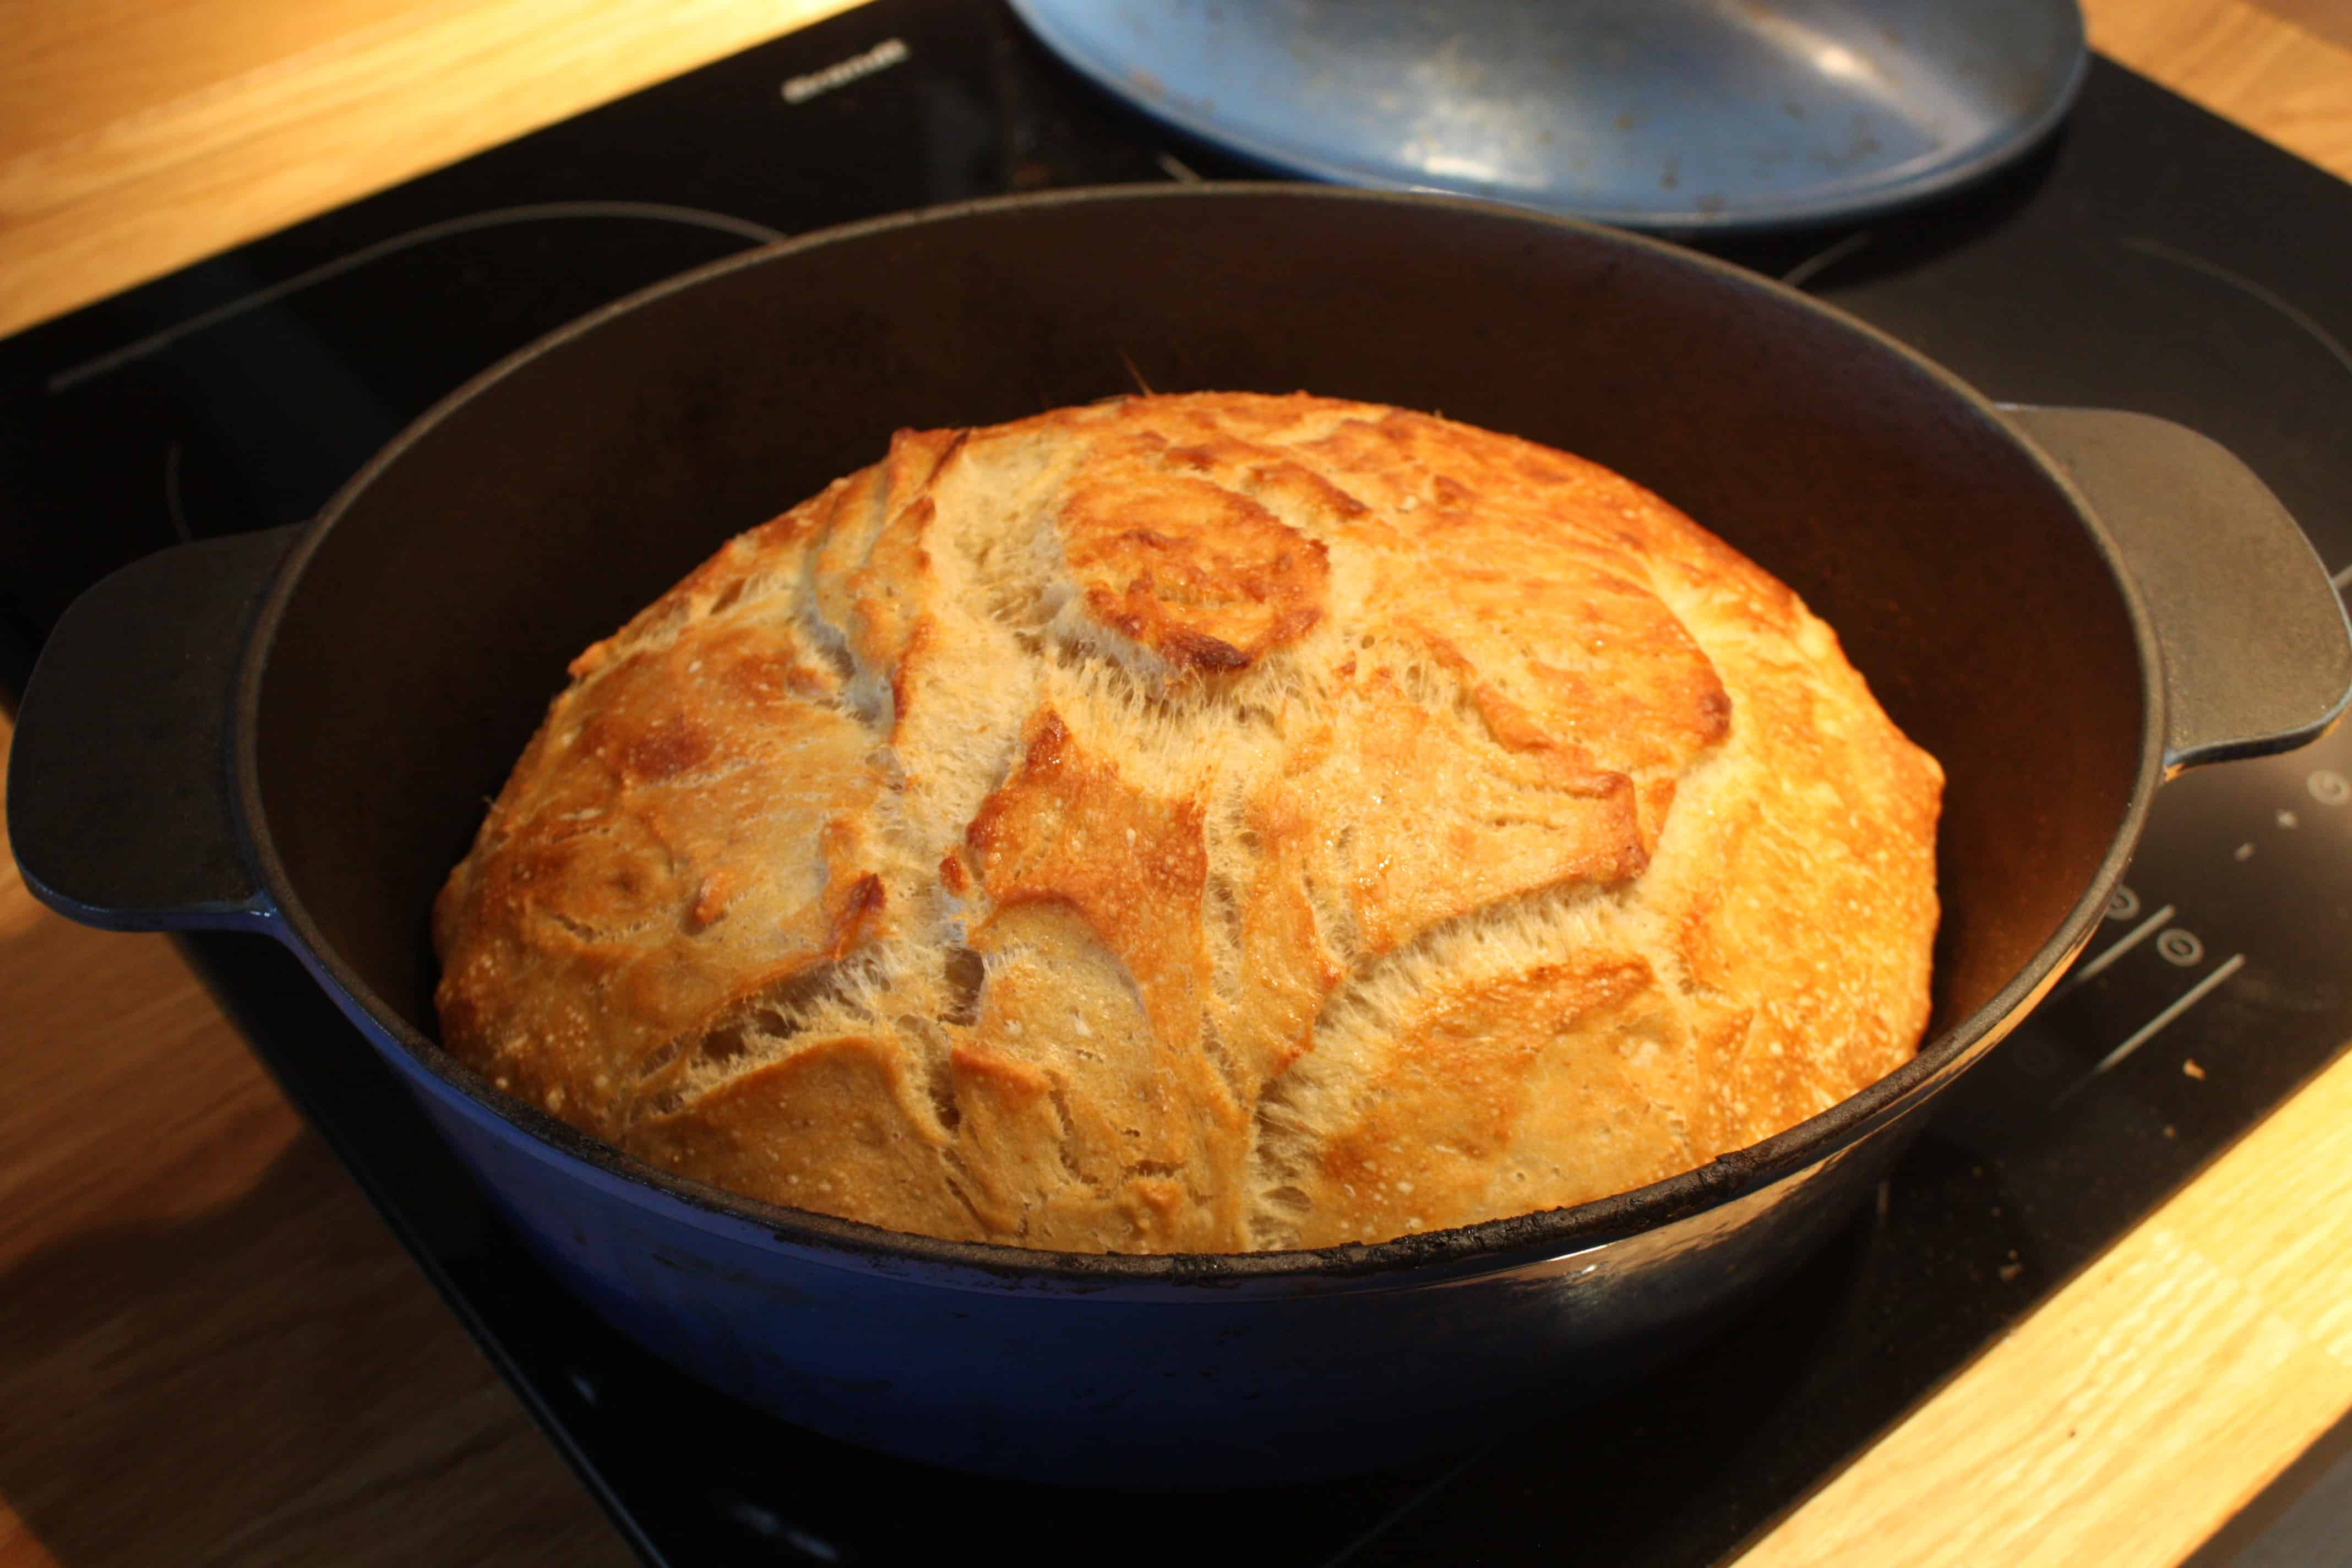 Semolinabrød- bagt som grydebrød